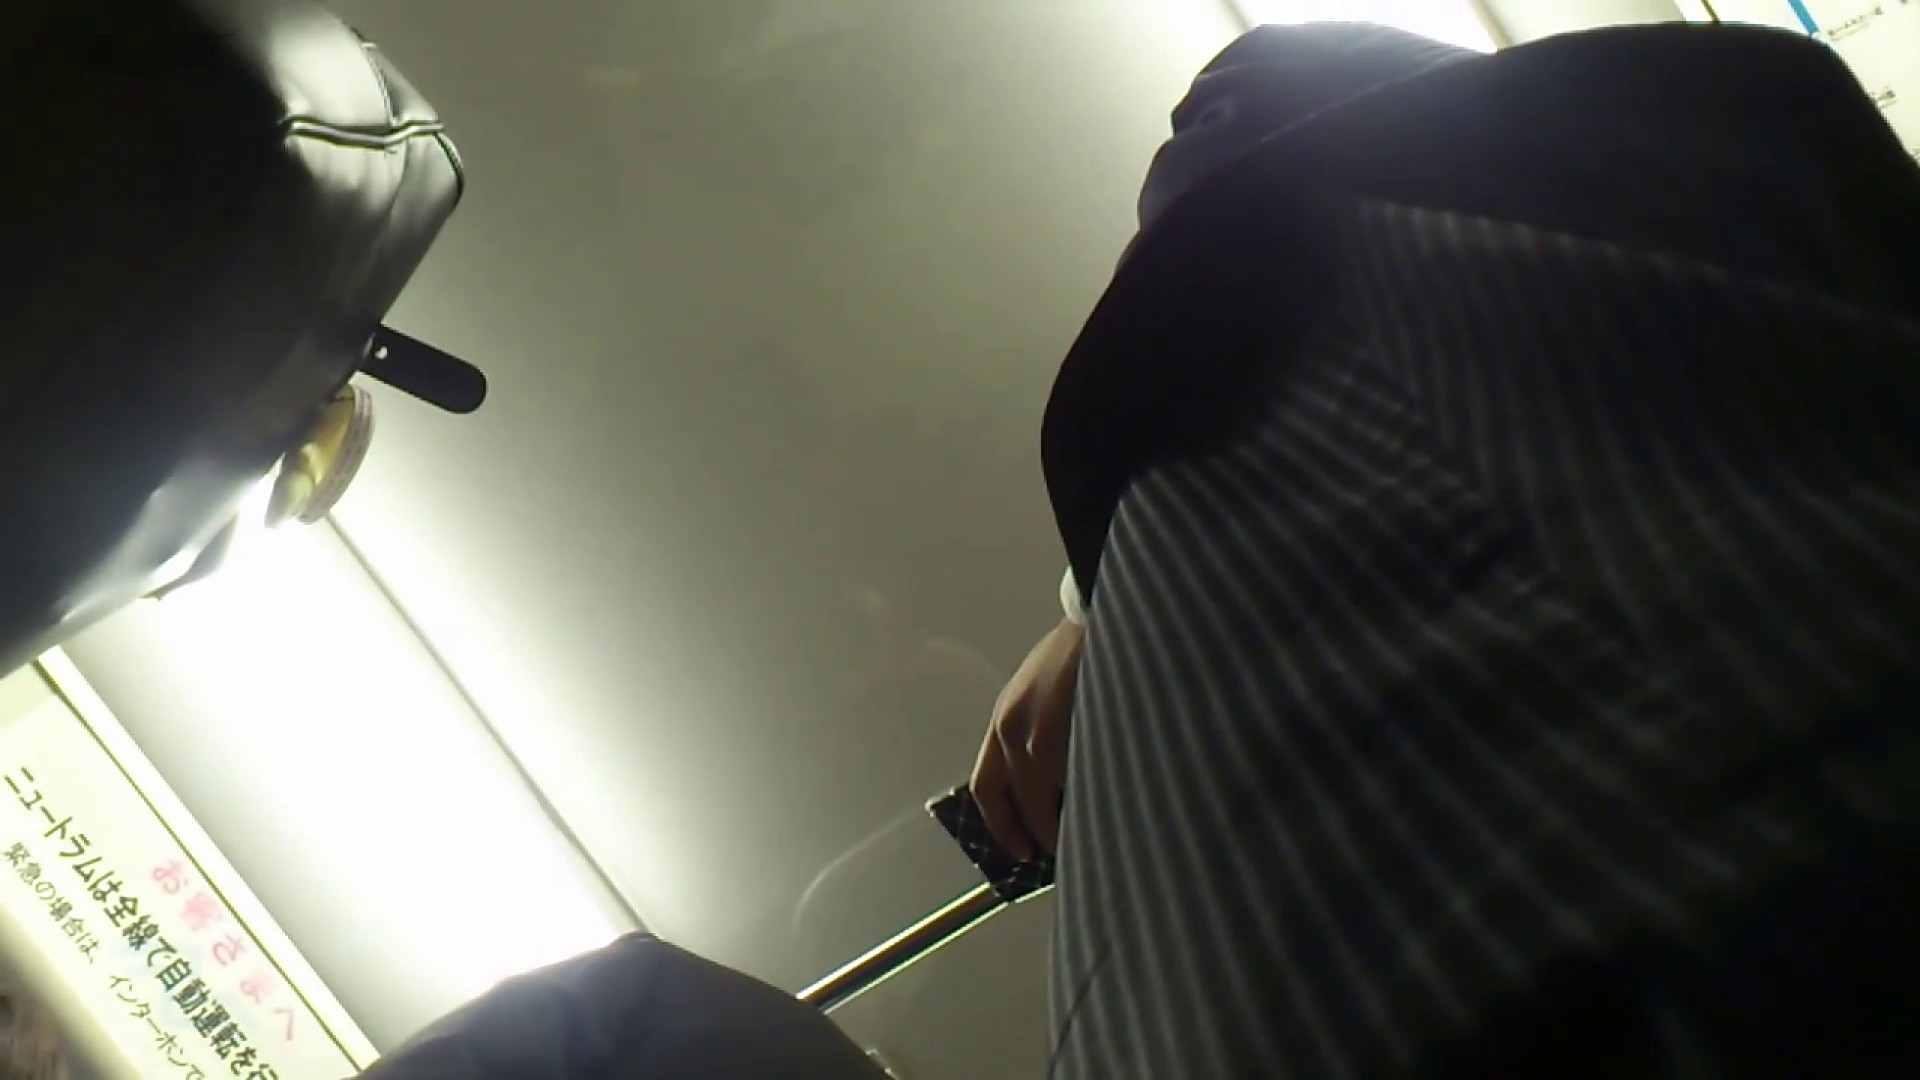 盗撮列車 Vol.50 制月反姿の妄想 OL女体 エロ無料画像 67連発 50